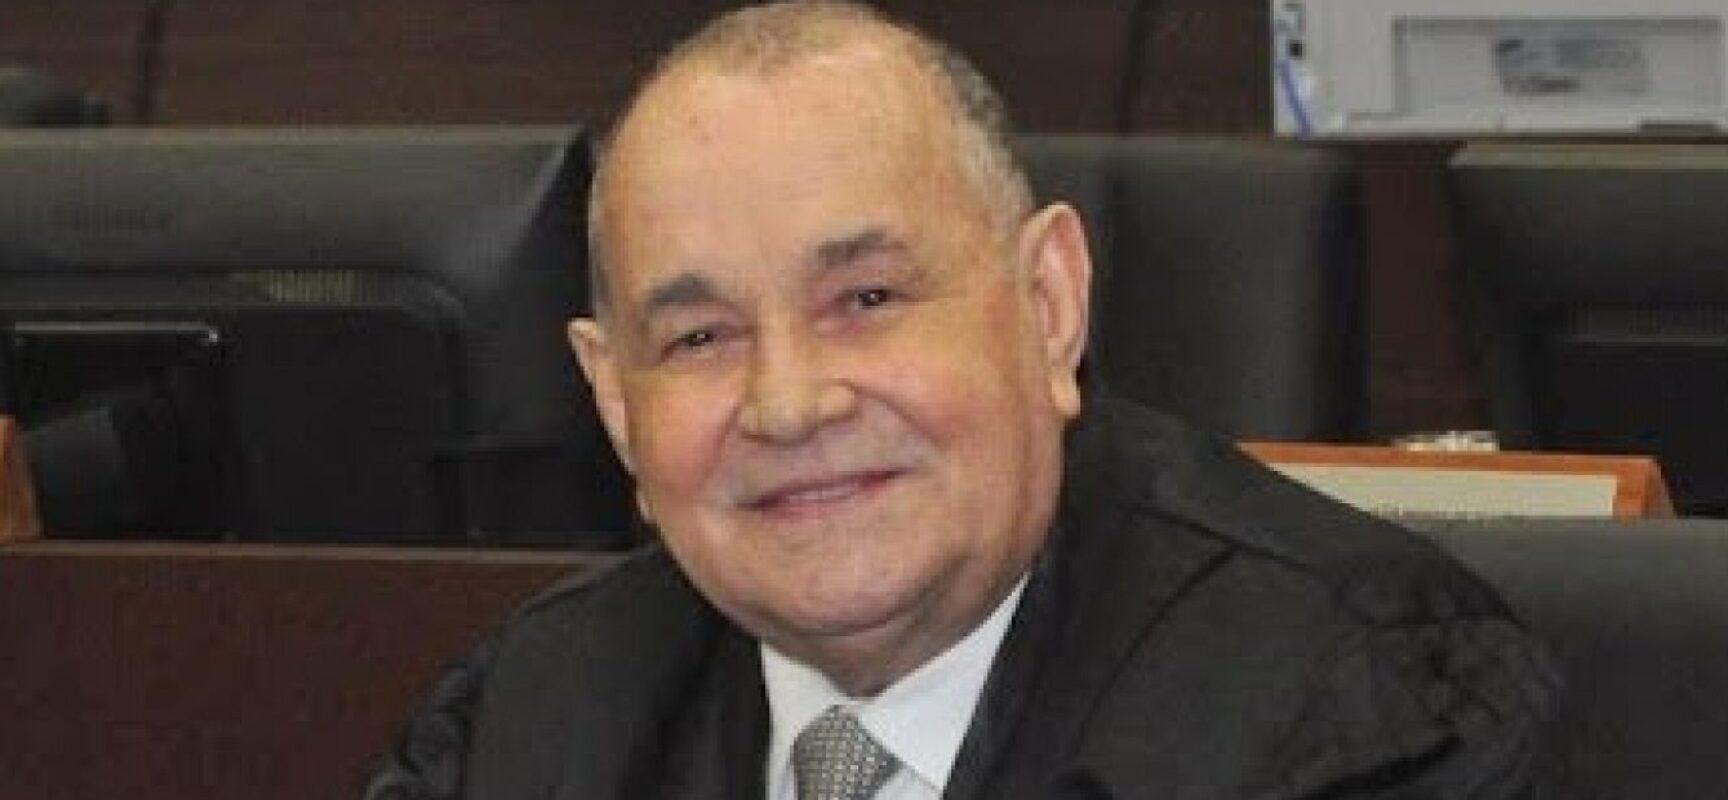 Faroeste: STJ mantém afastamento do desembargador Gesivaldo Brito